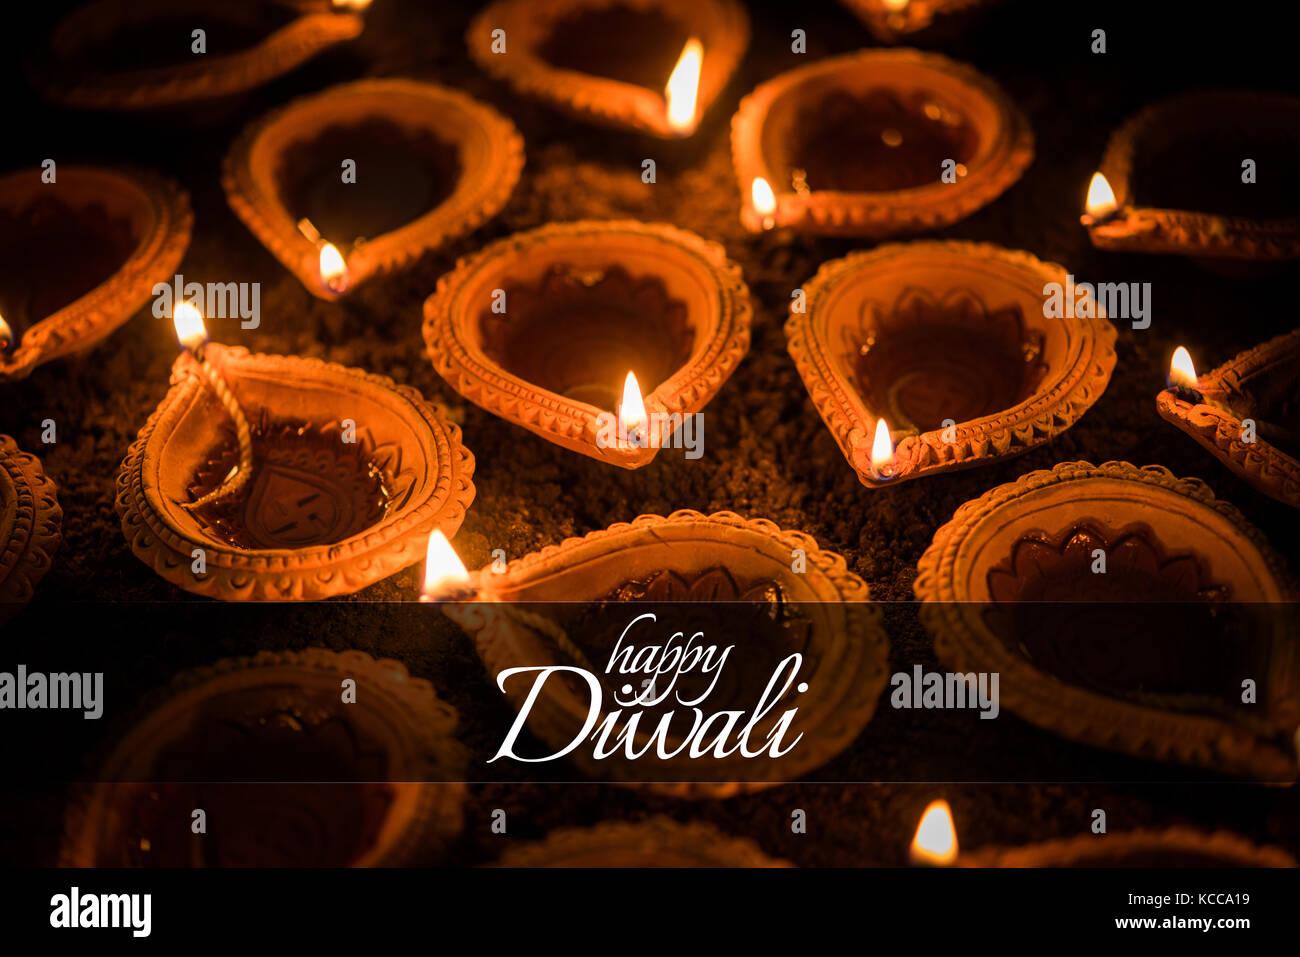 Happy diwali greeting card design using beautiful clay diya lamps happy diwali greeting card design using beautiful clay diya lamps lit on diwali night celebration indian hindu light festival called diwali a festi m4hsunfo